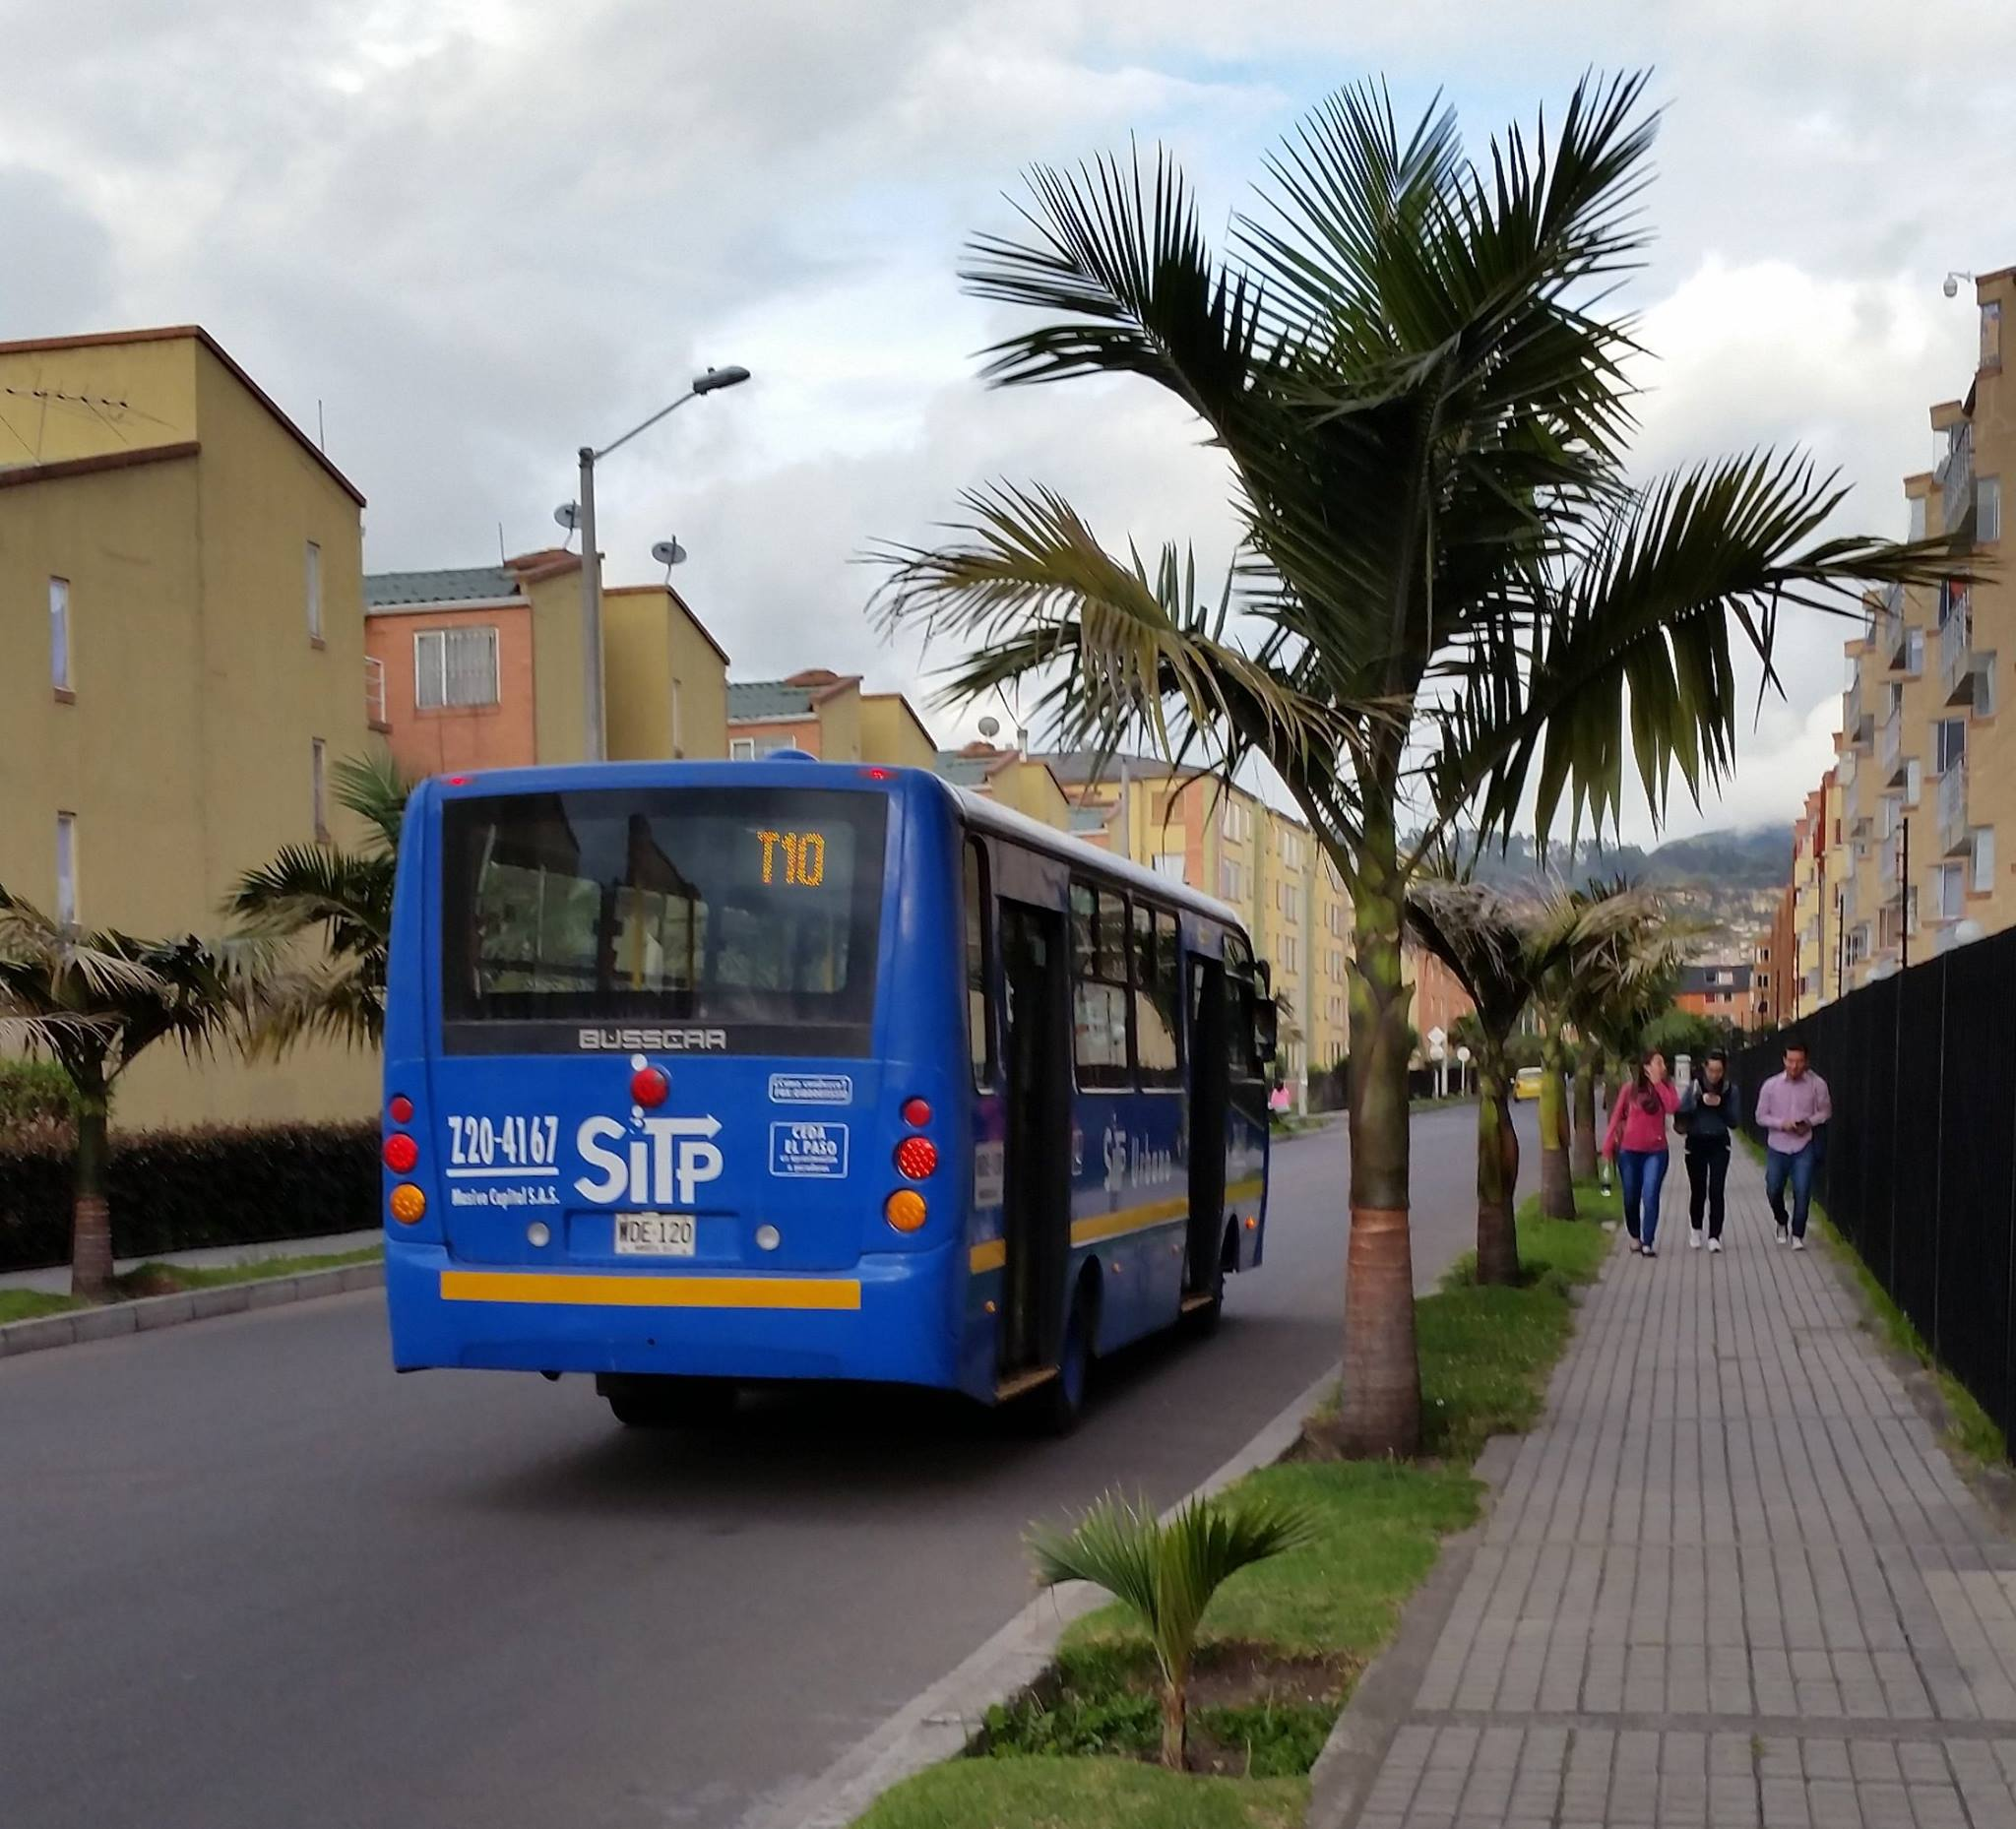 Foto ruta T10 - complementaria, operando con buses azules